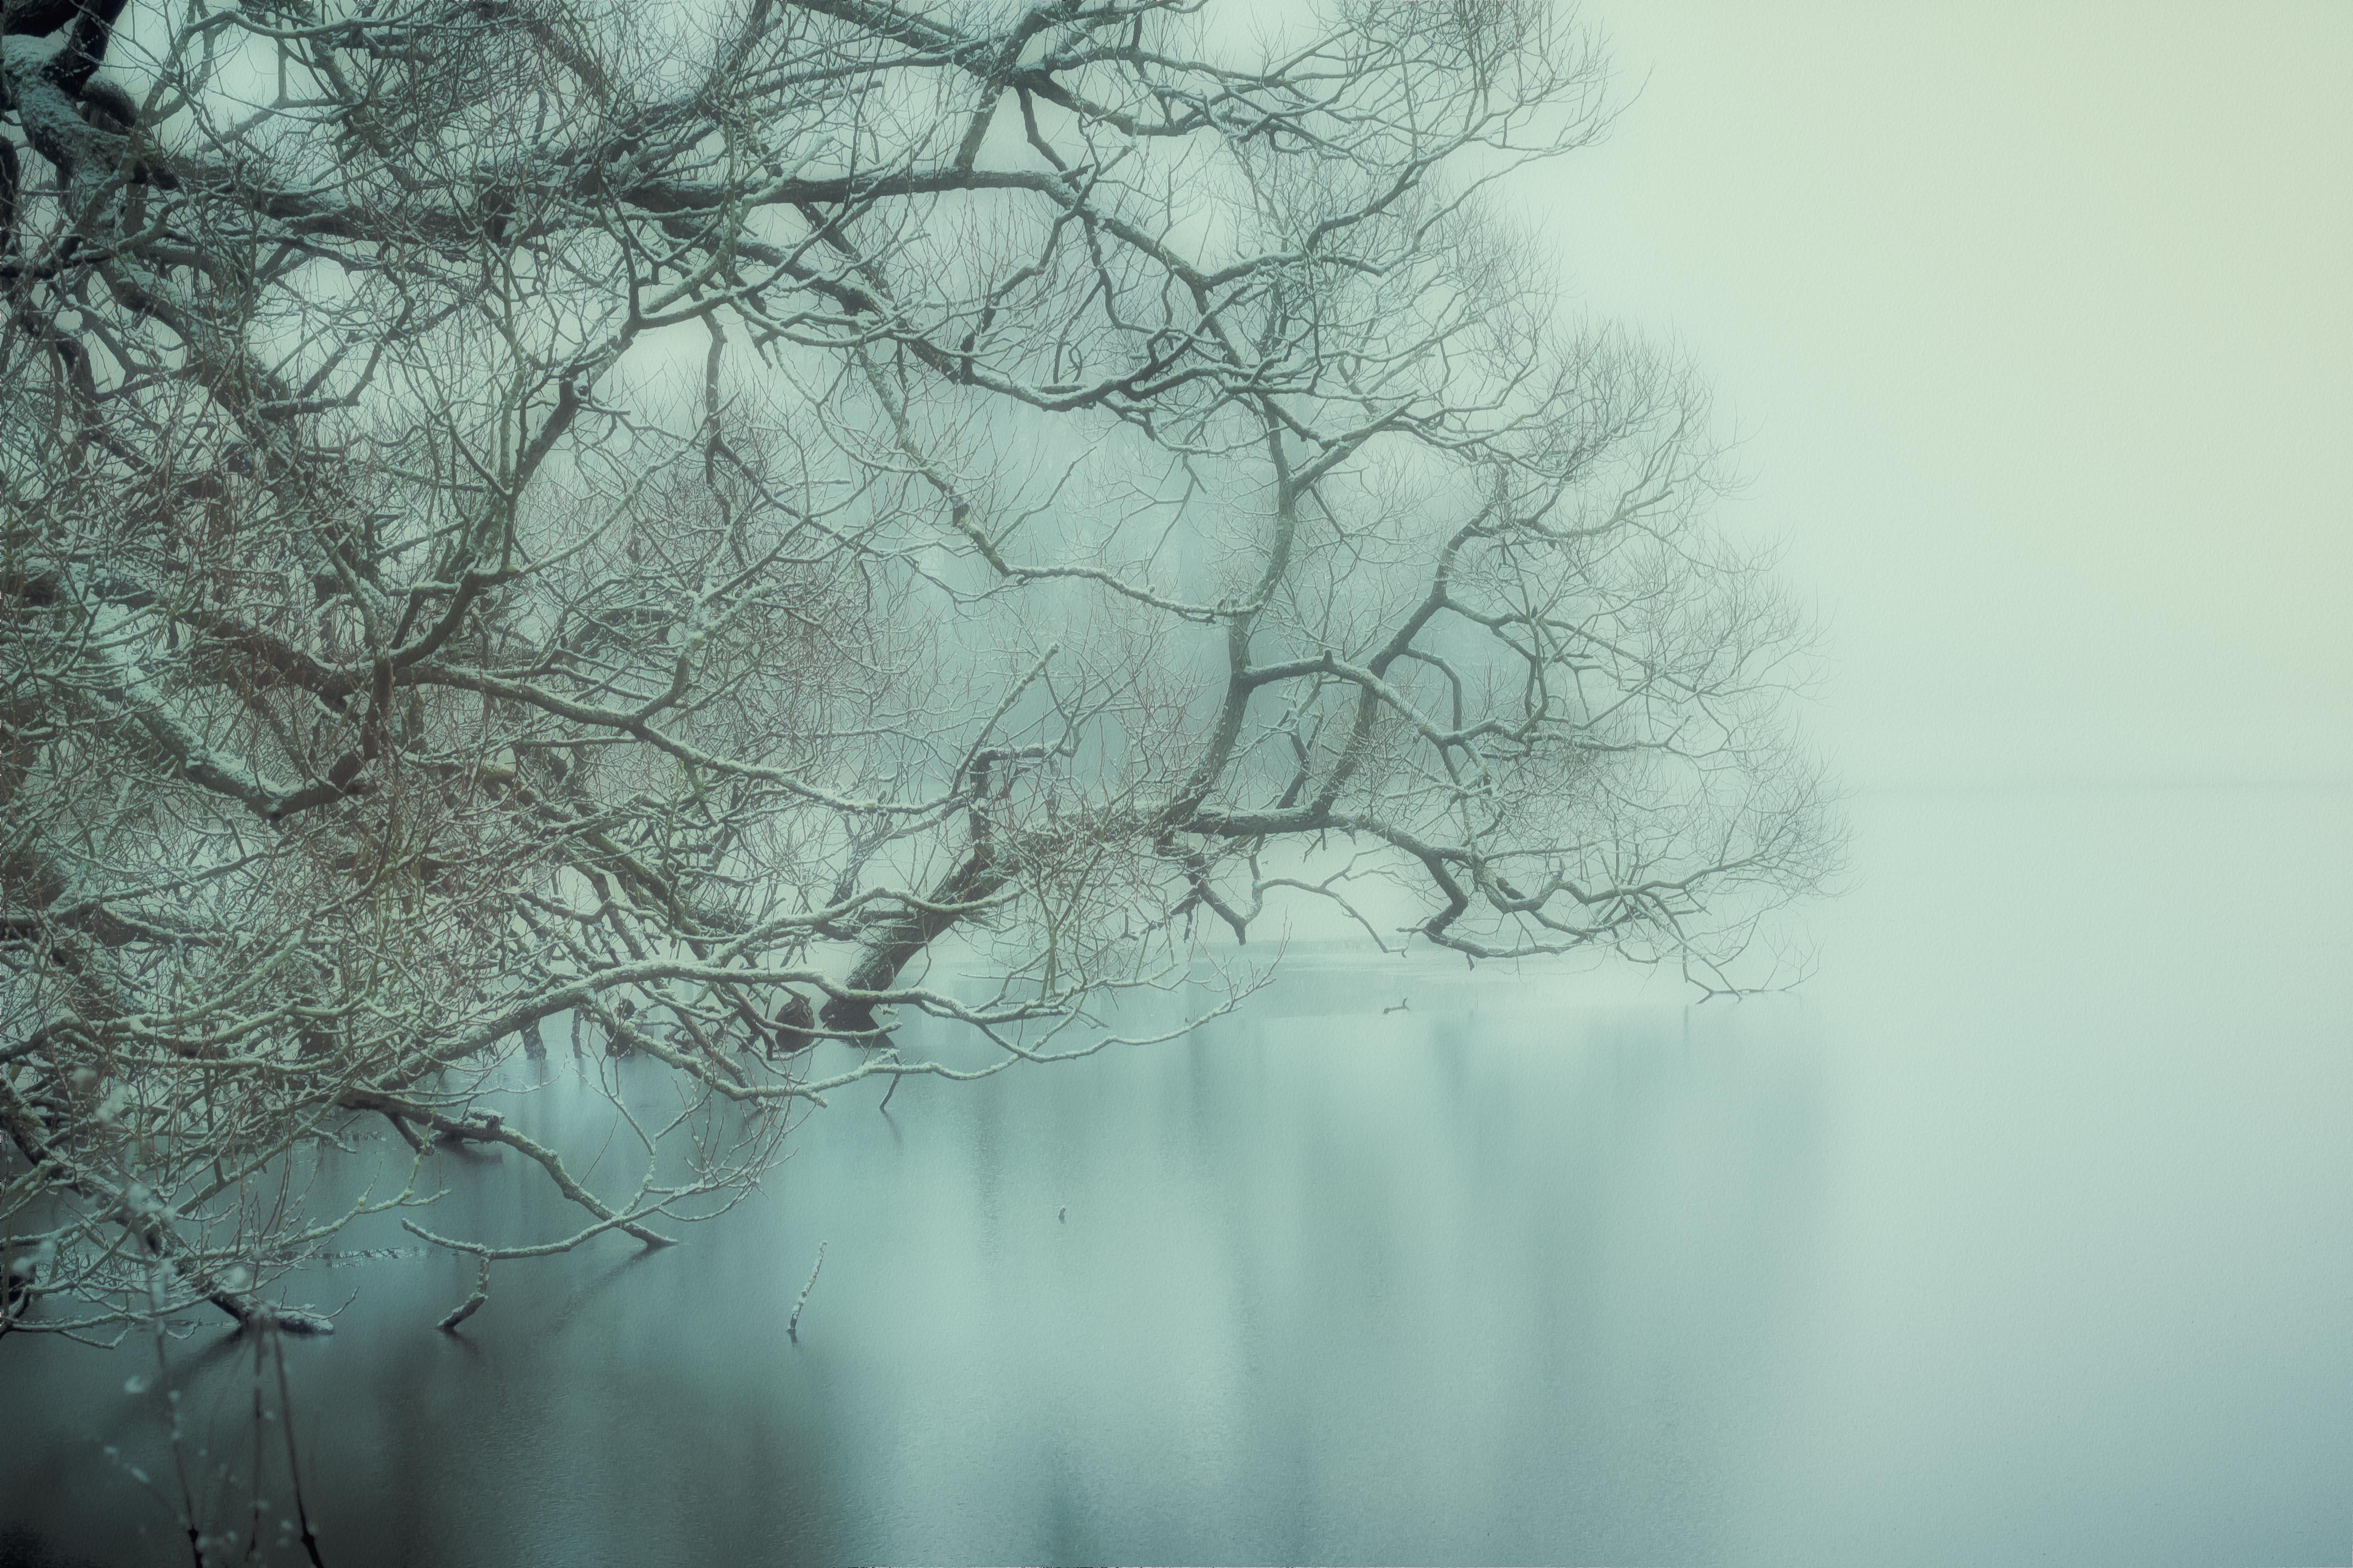 Frosty Fog I